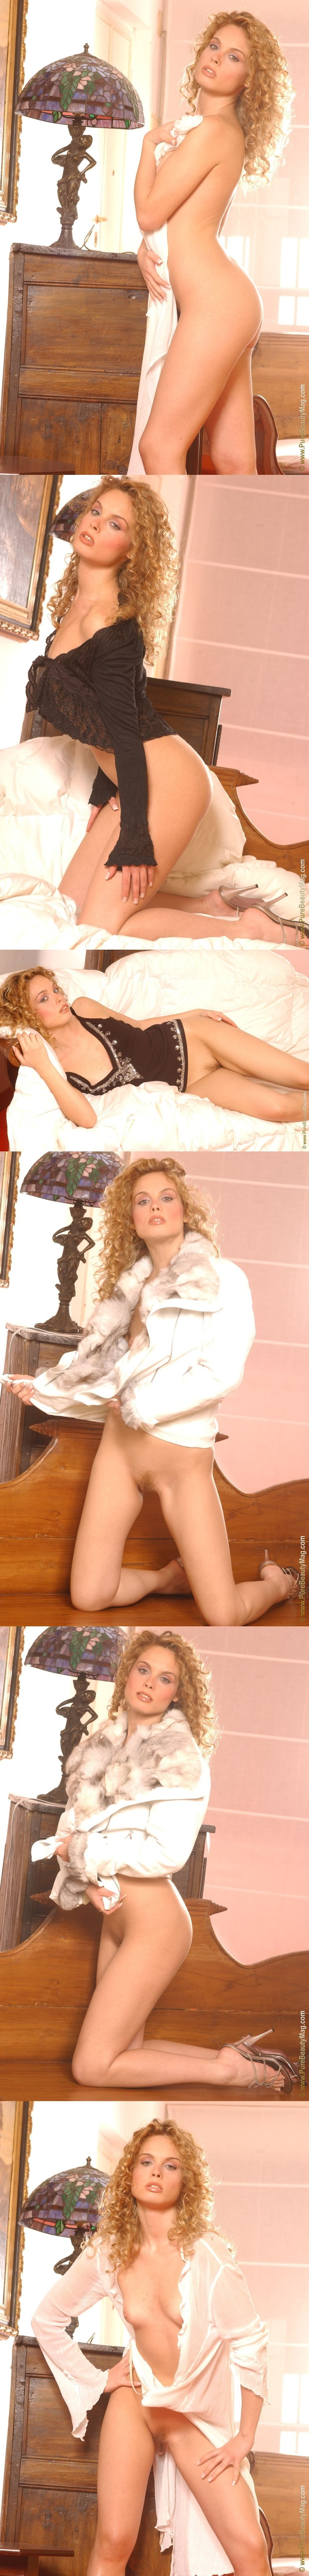 PureBeautyMag PBM  - 2007-03-25 - #s337229 - Denisa Cisic - Hatty Beauty - 3872px purebeautymag 08150